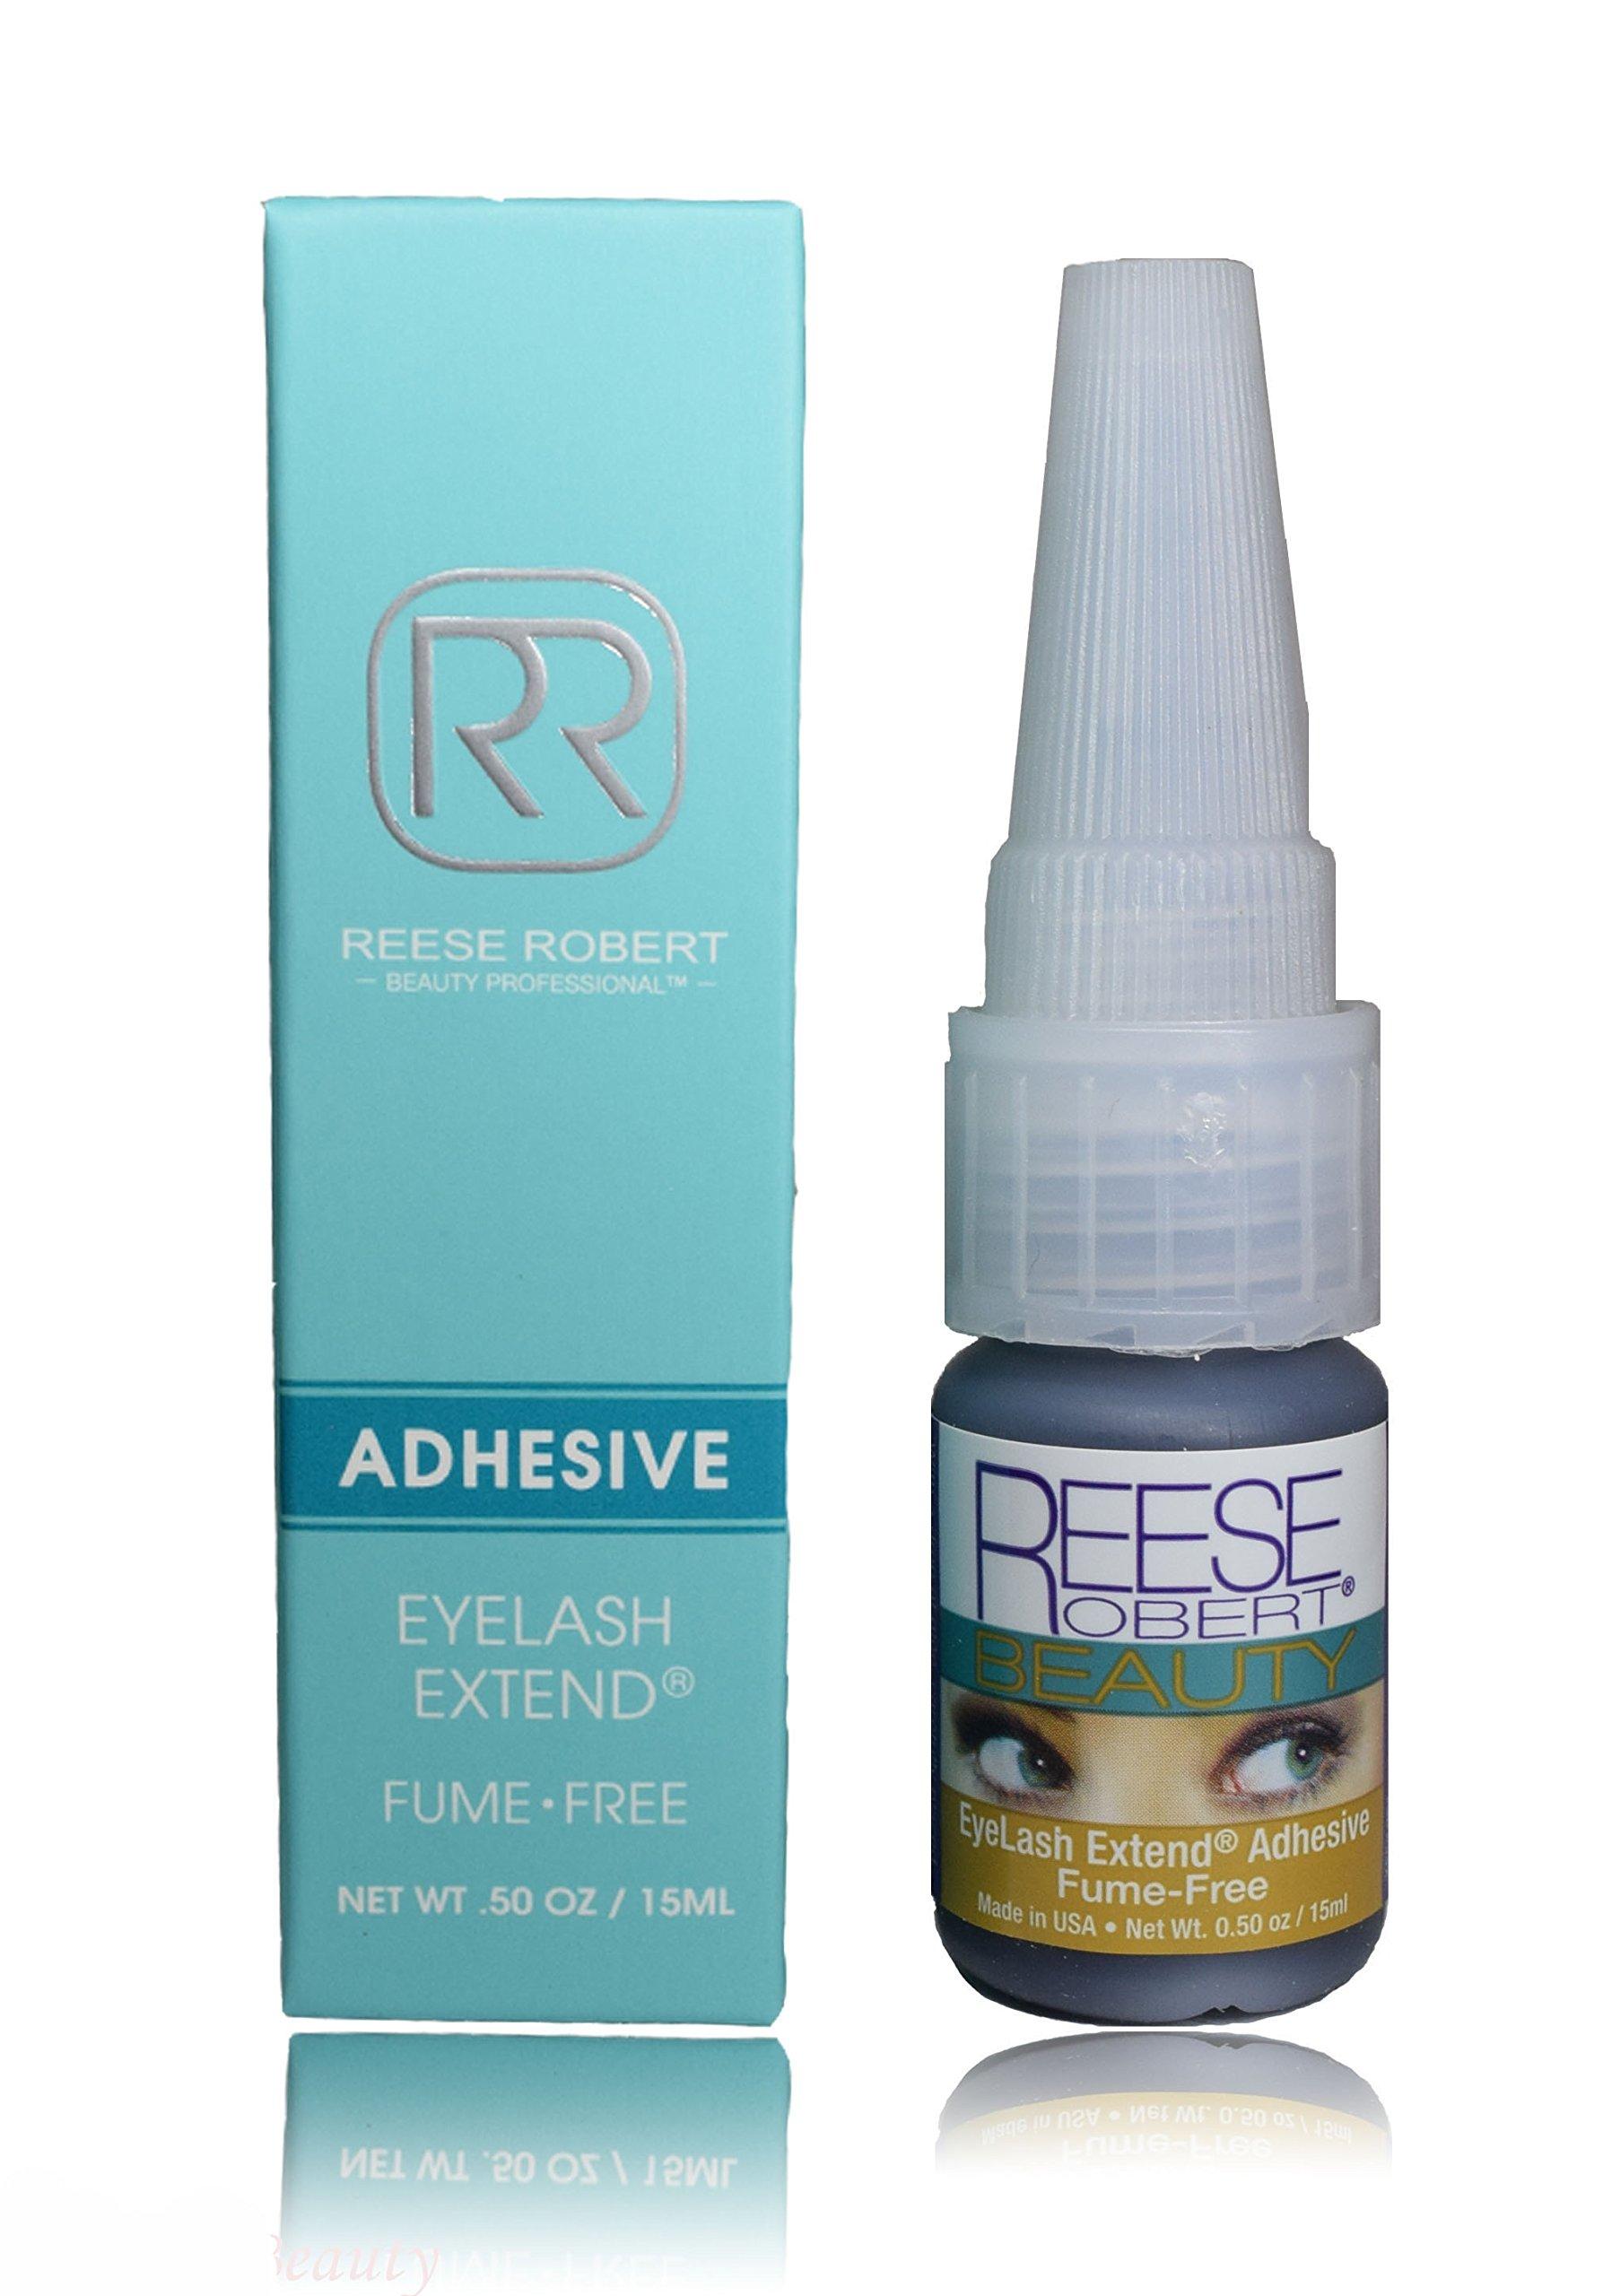 Reese Robert Beauty Eyelash Extend Adhesive, 0.5 Ounce by Reese Robert Beauty by Reese Robert Beauty Professional